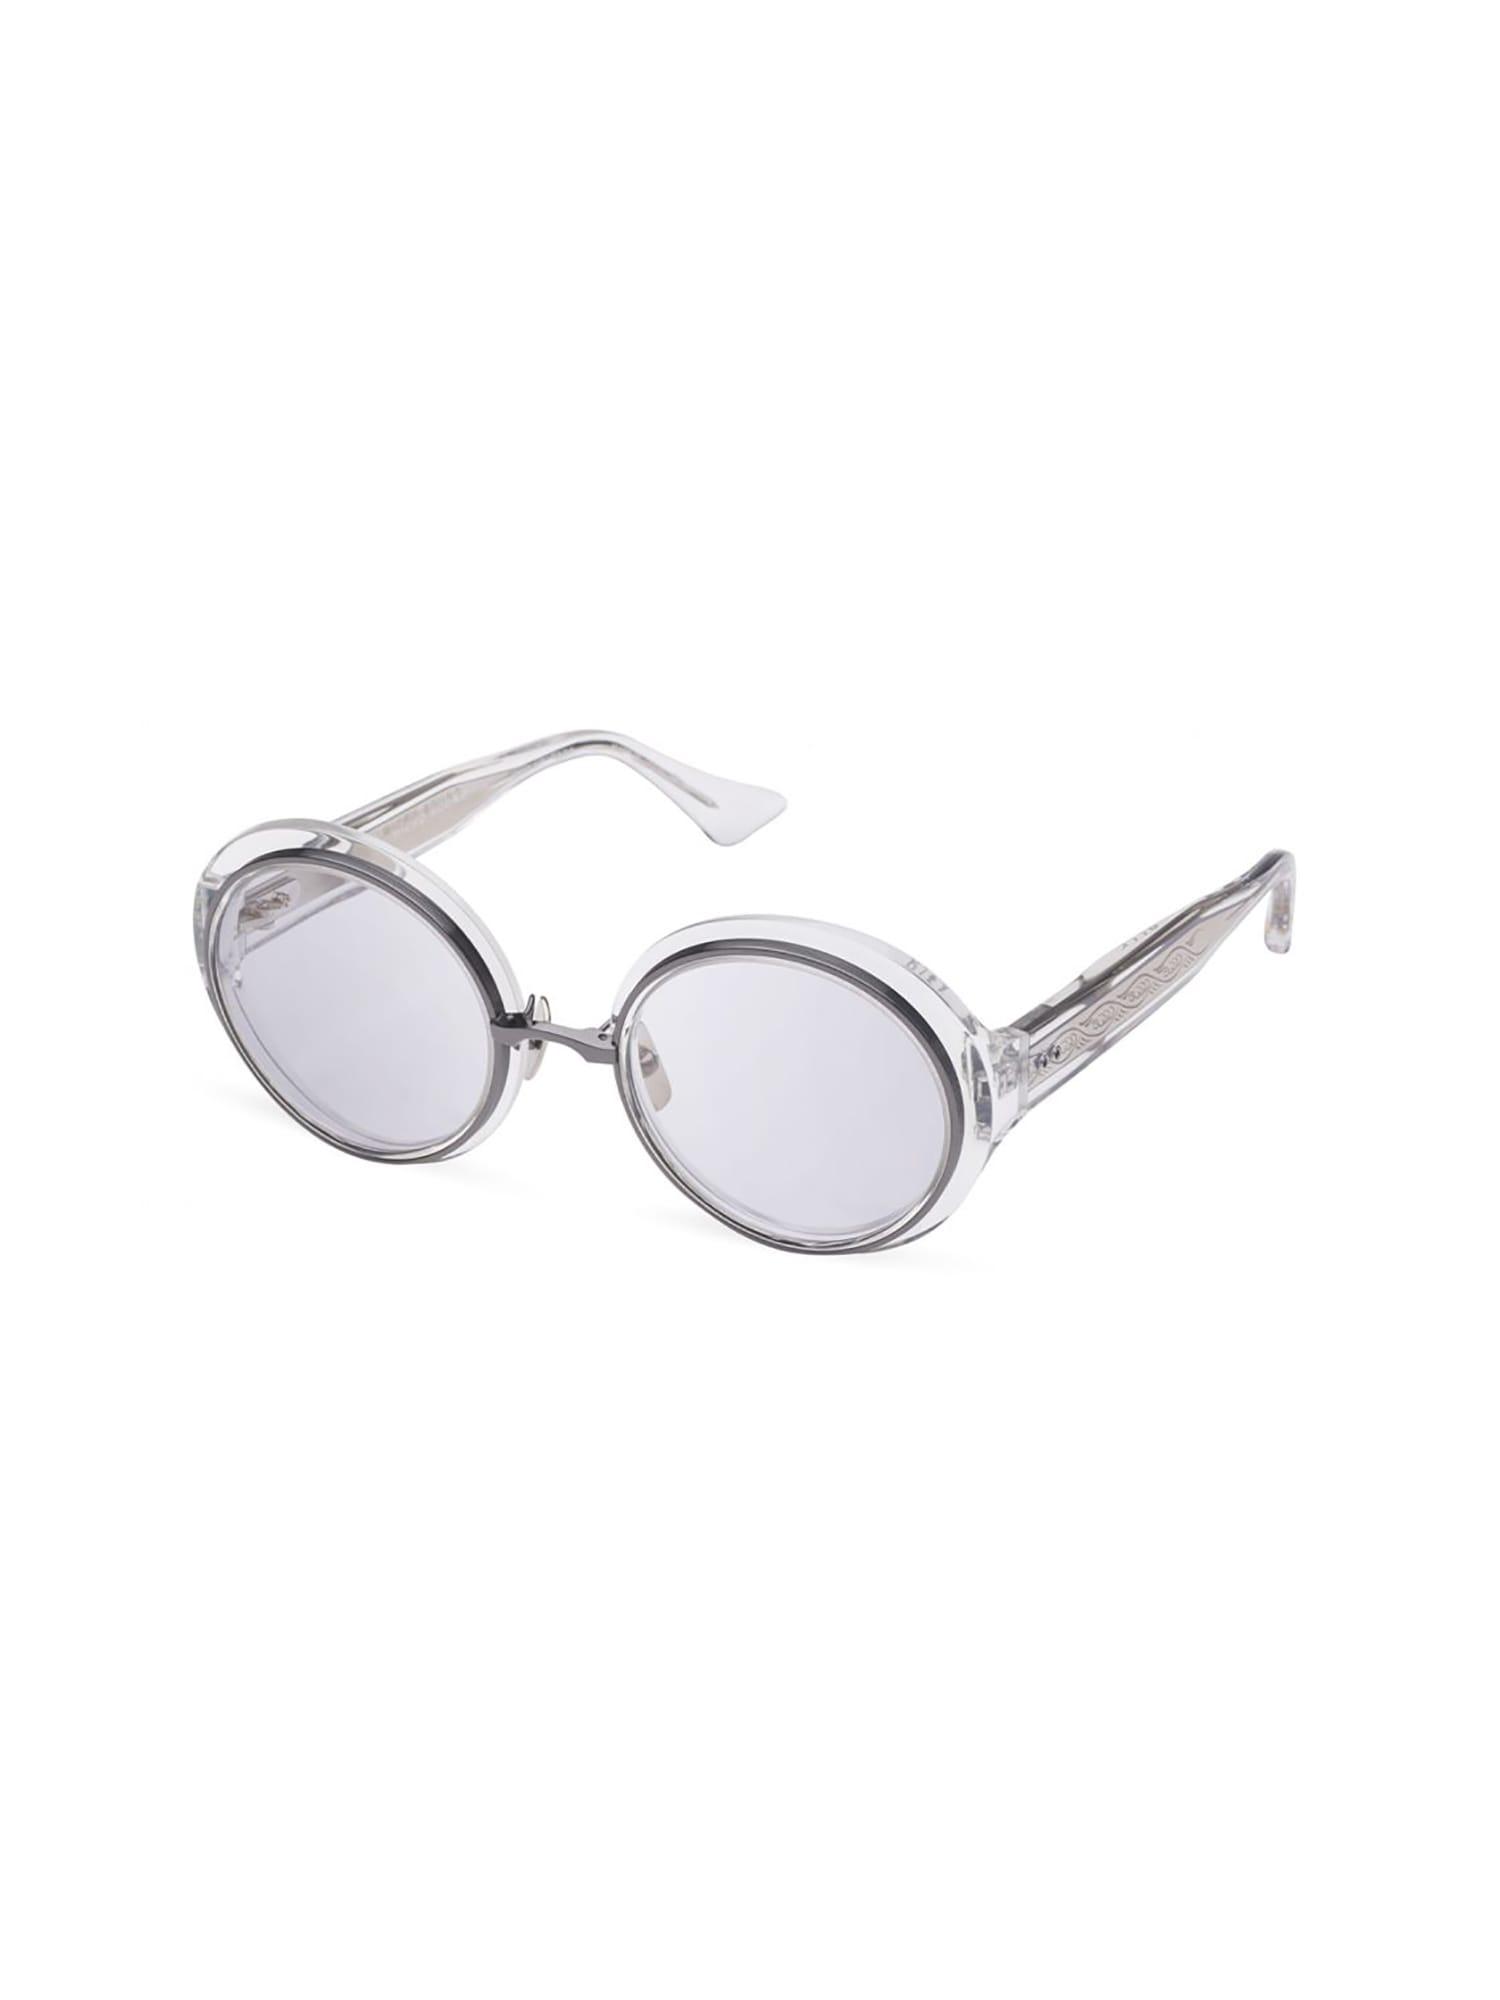 DTS406/A/03 MICRO Sunglasses